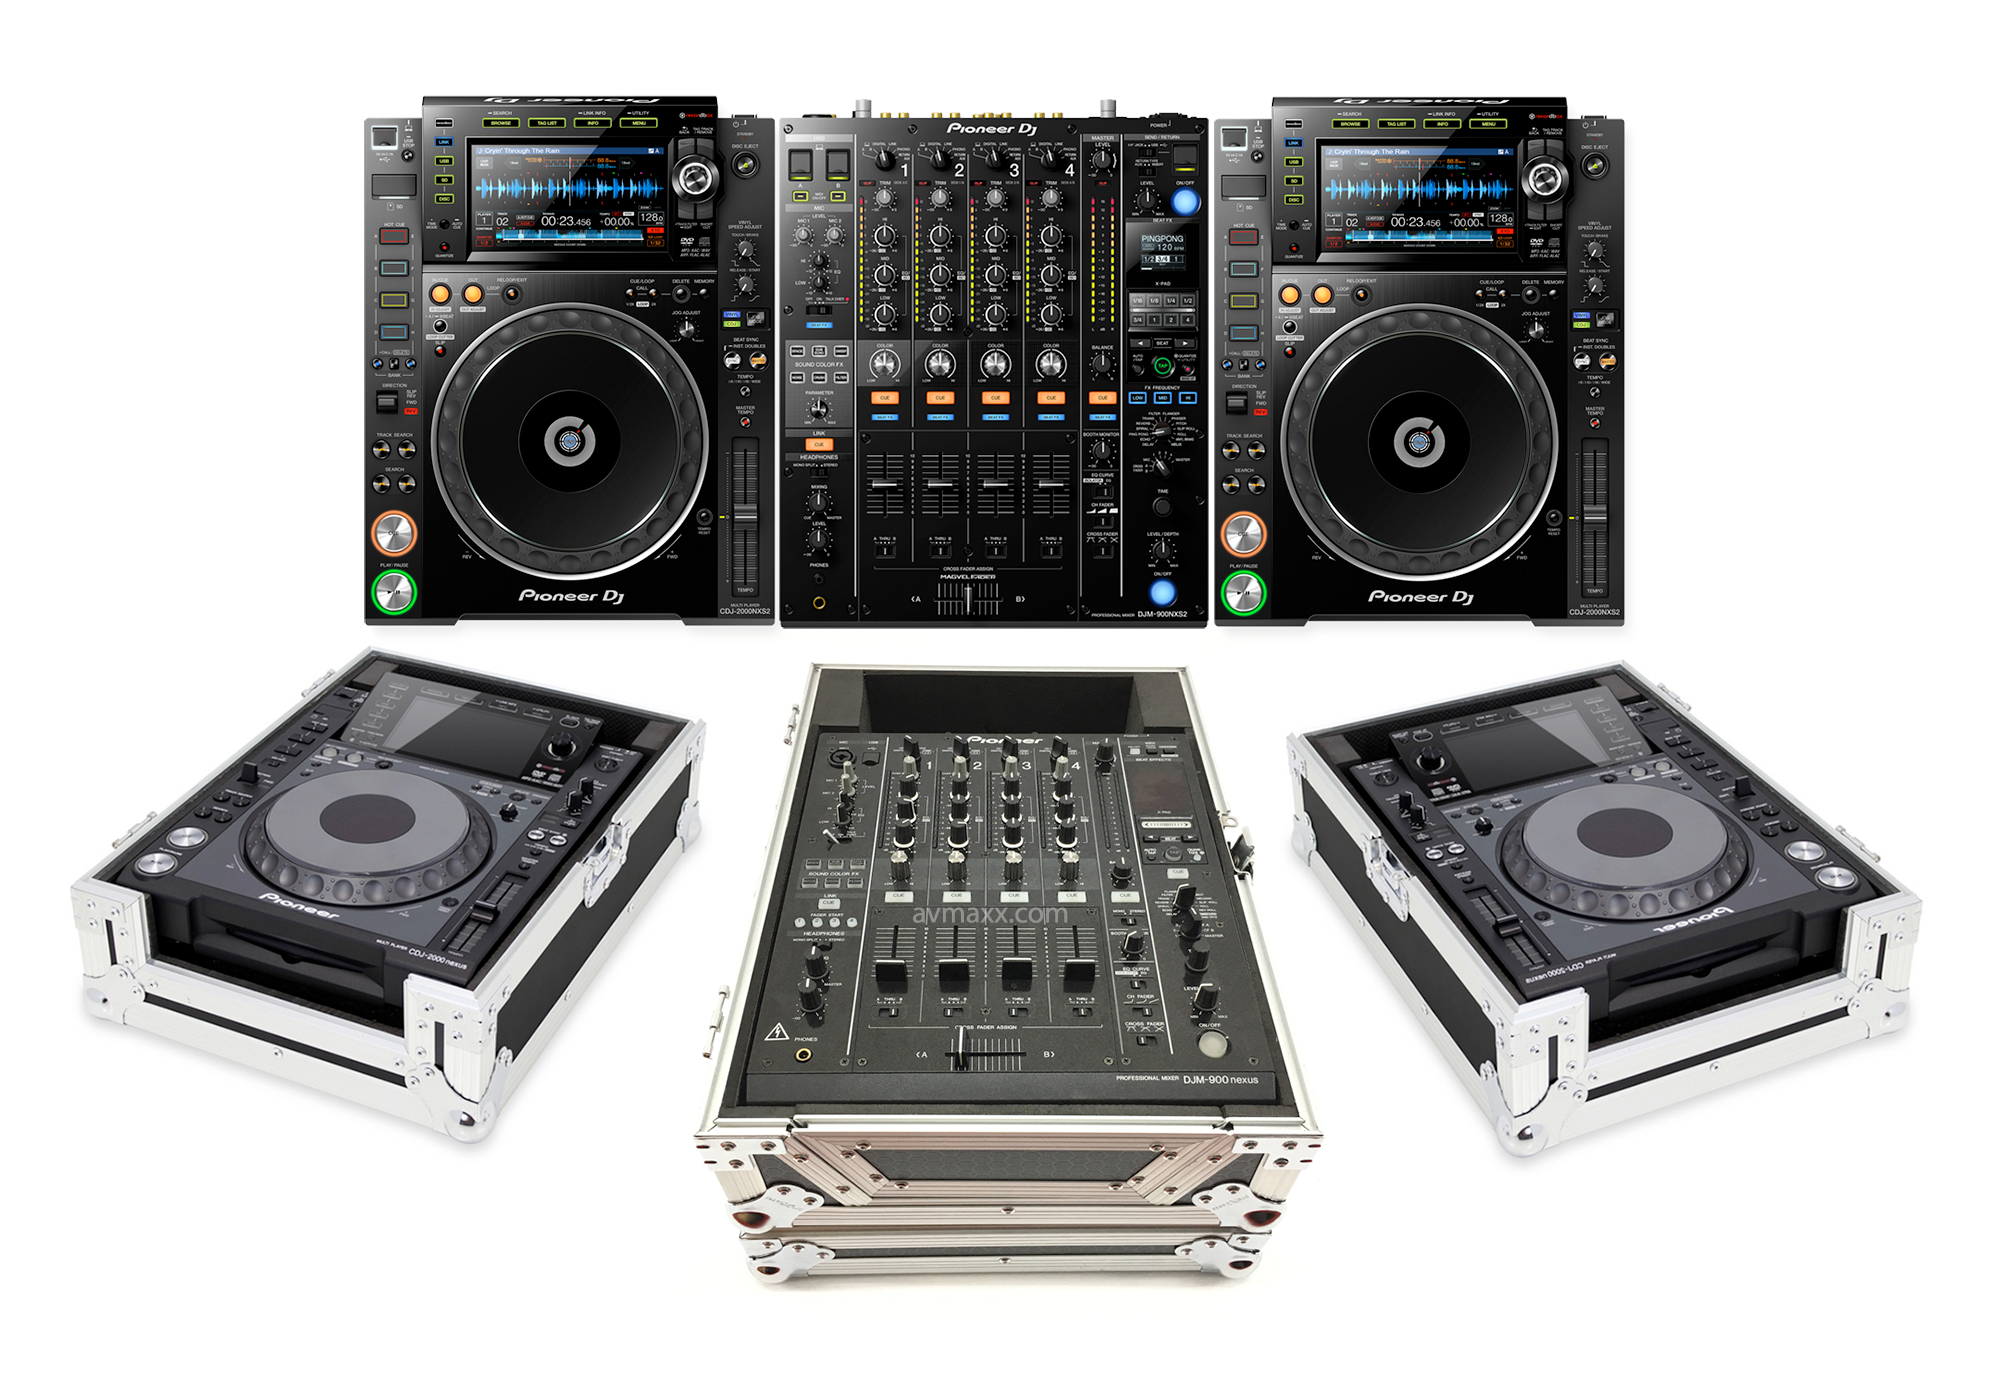 Pioneer Dj Cdj 2000nxs2 Multi Players Amp Djm 900nxs2 4